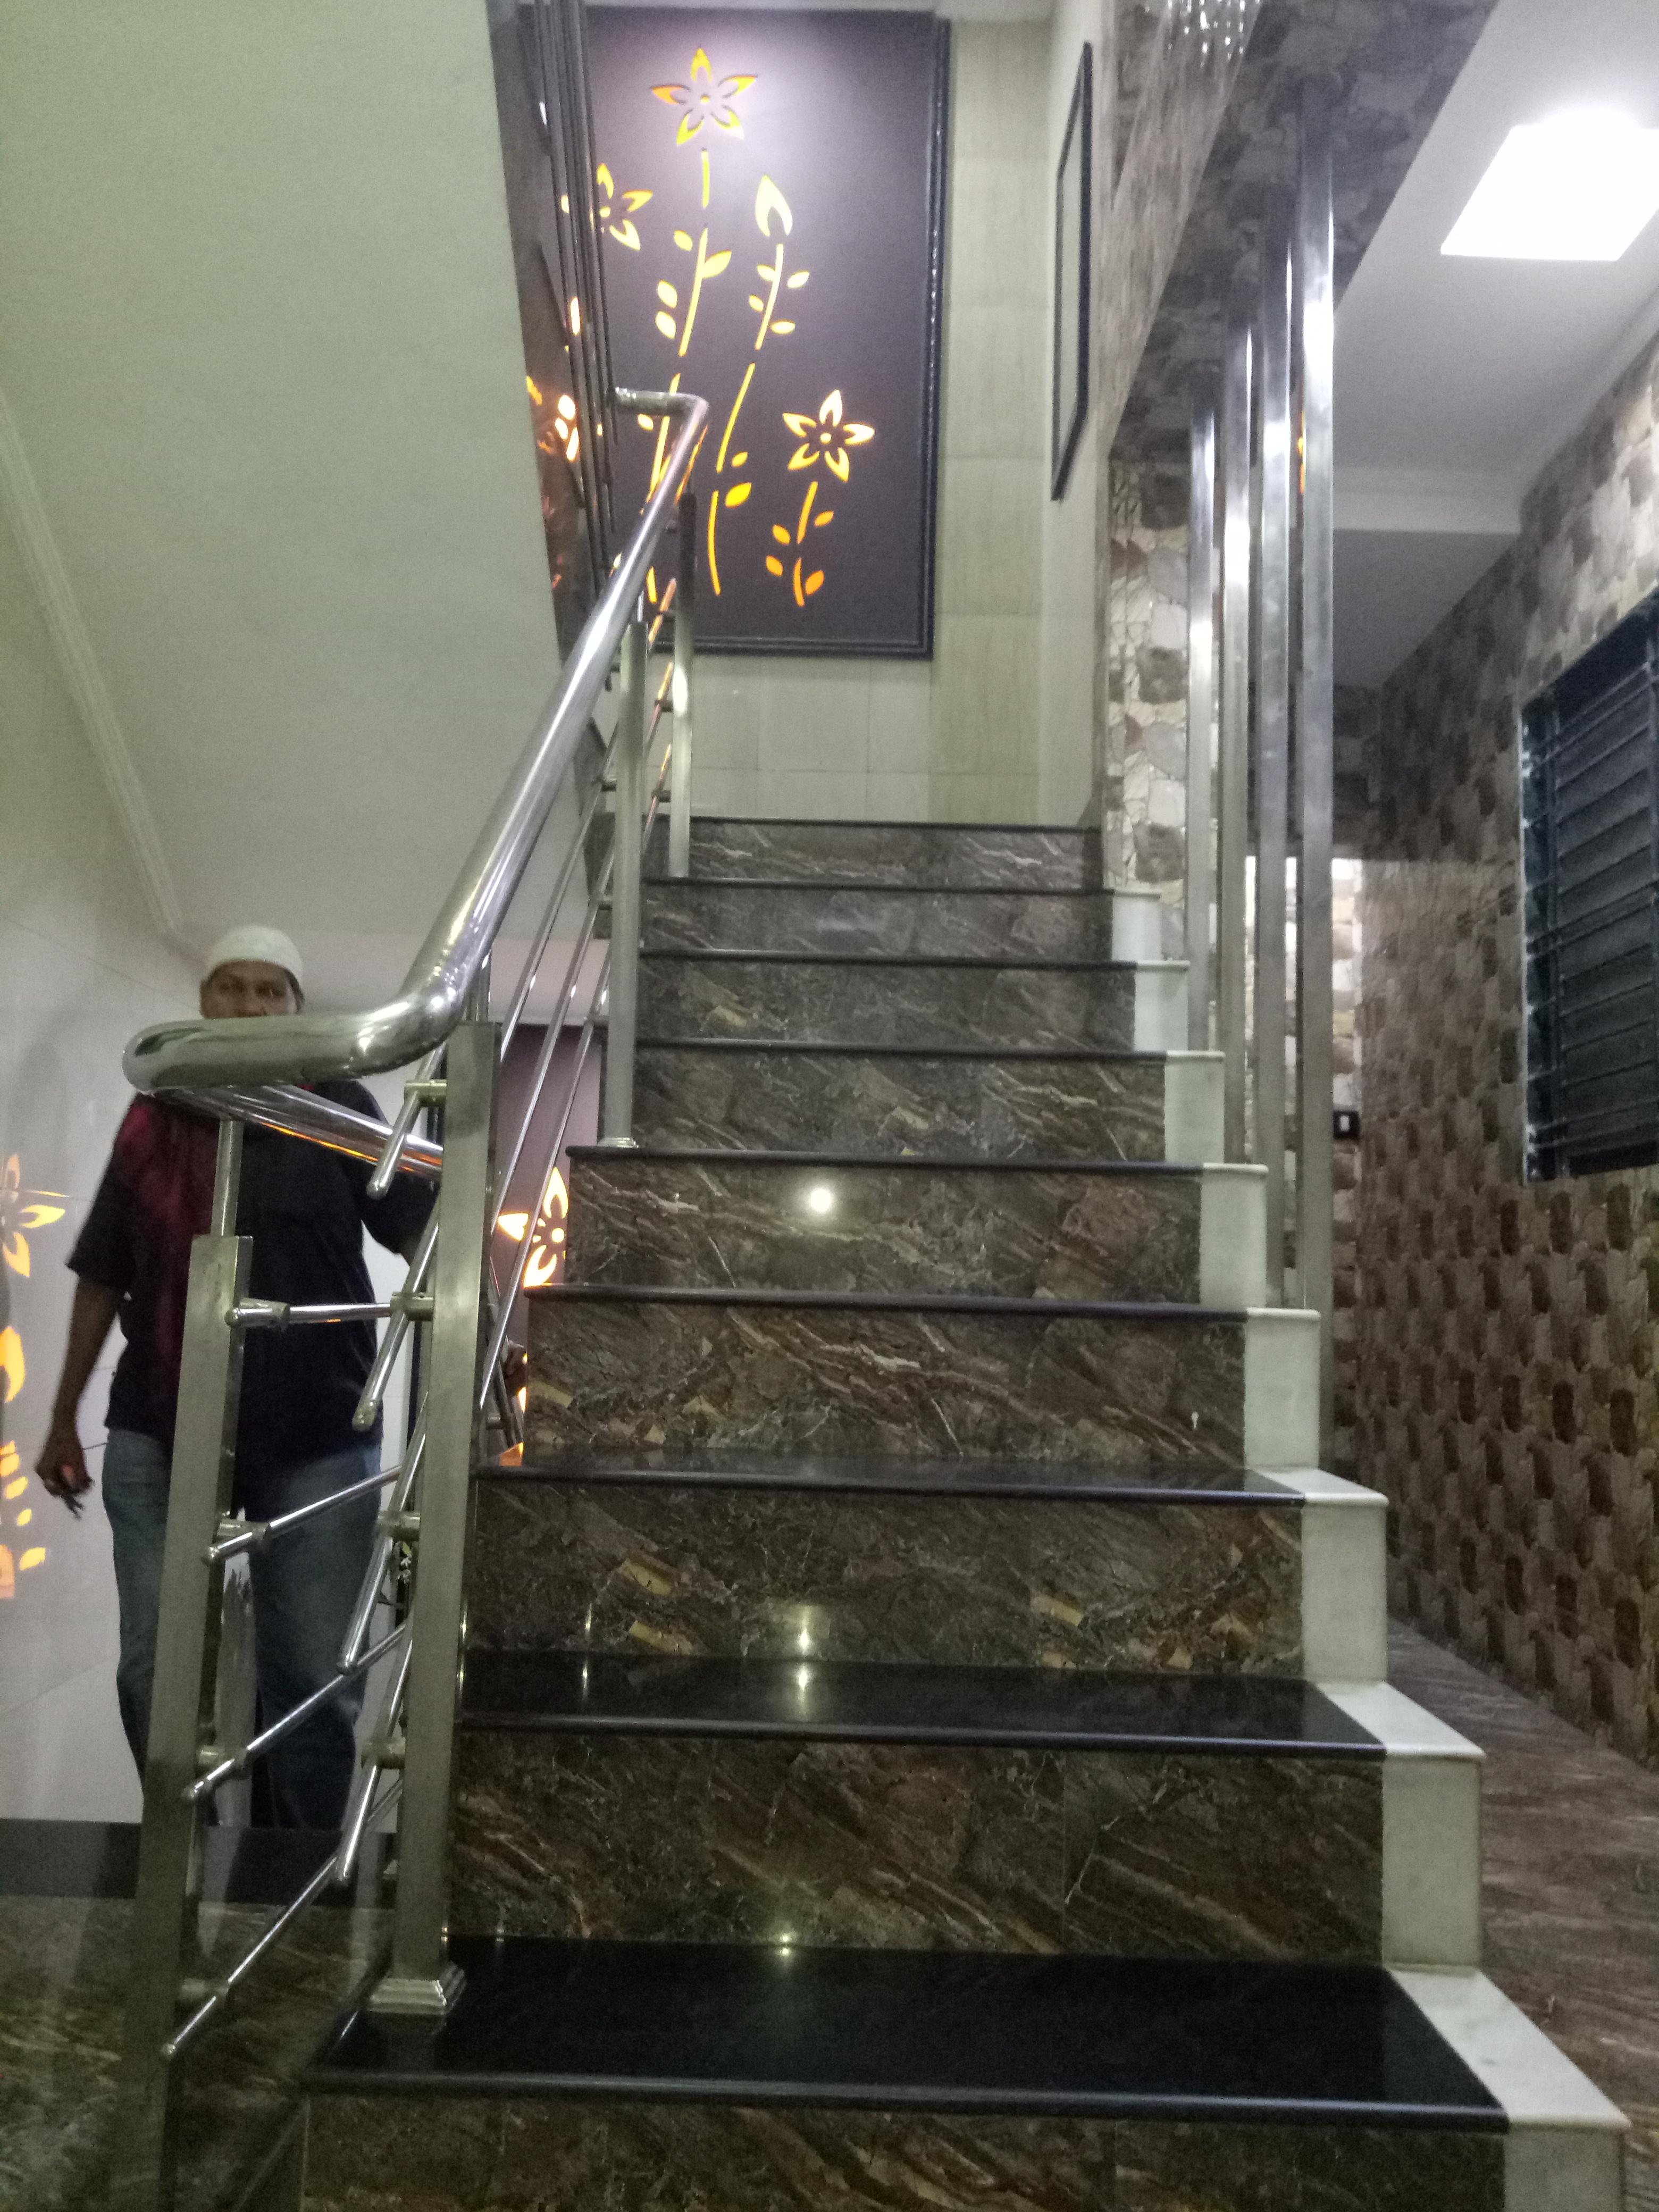 Hotel Tanishq Lodging_image0